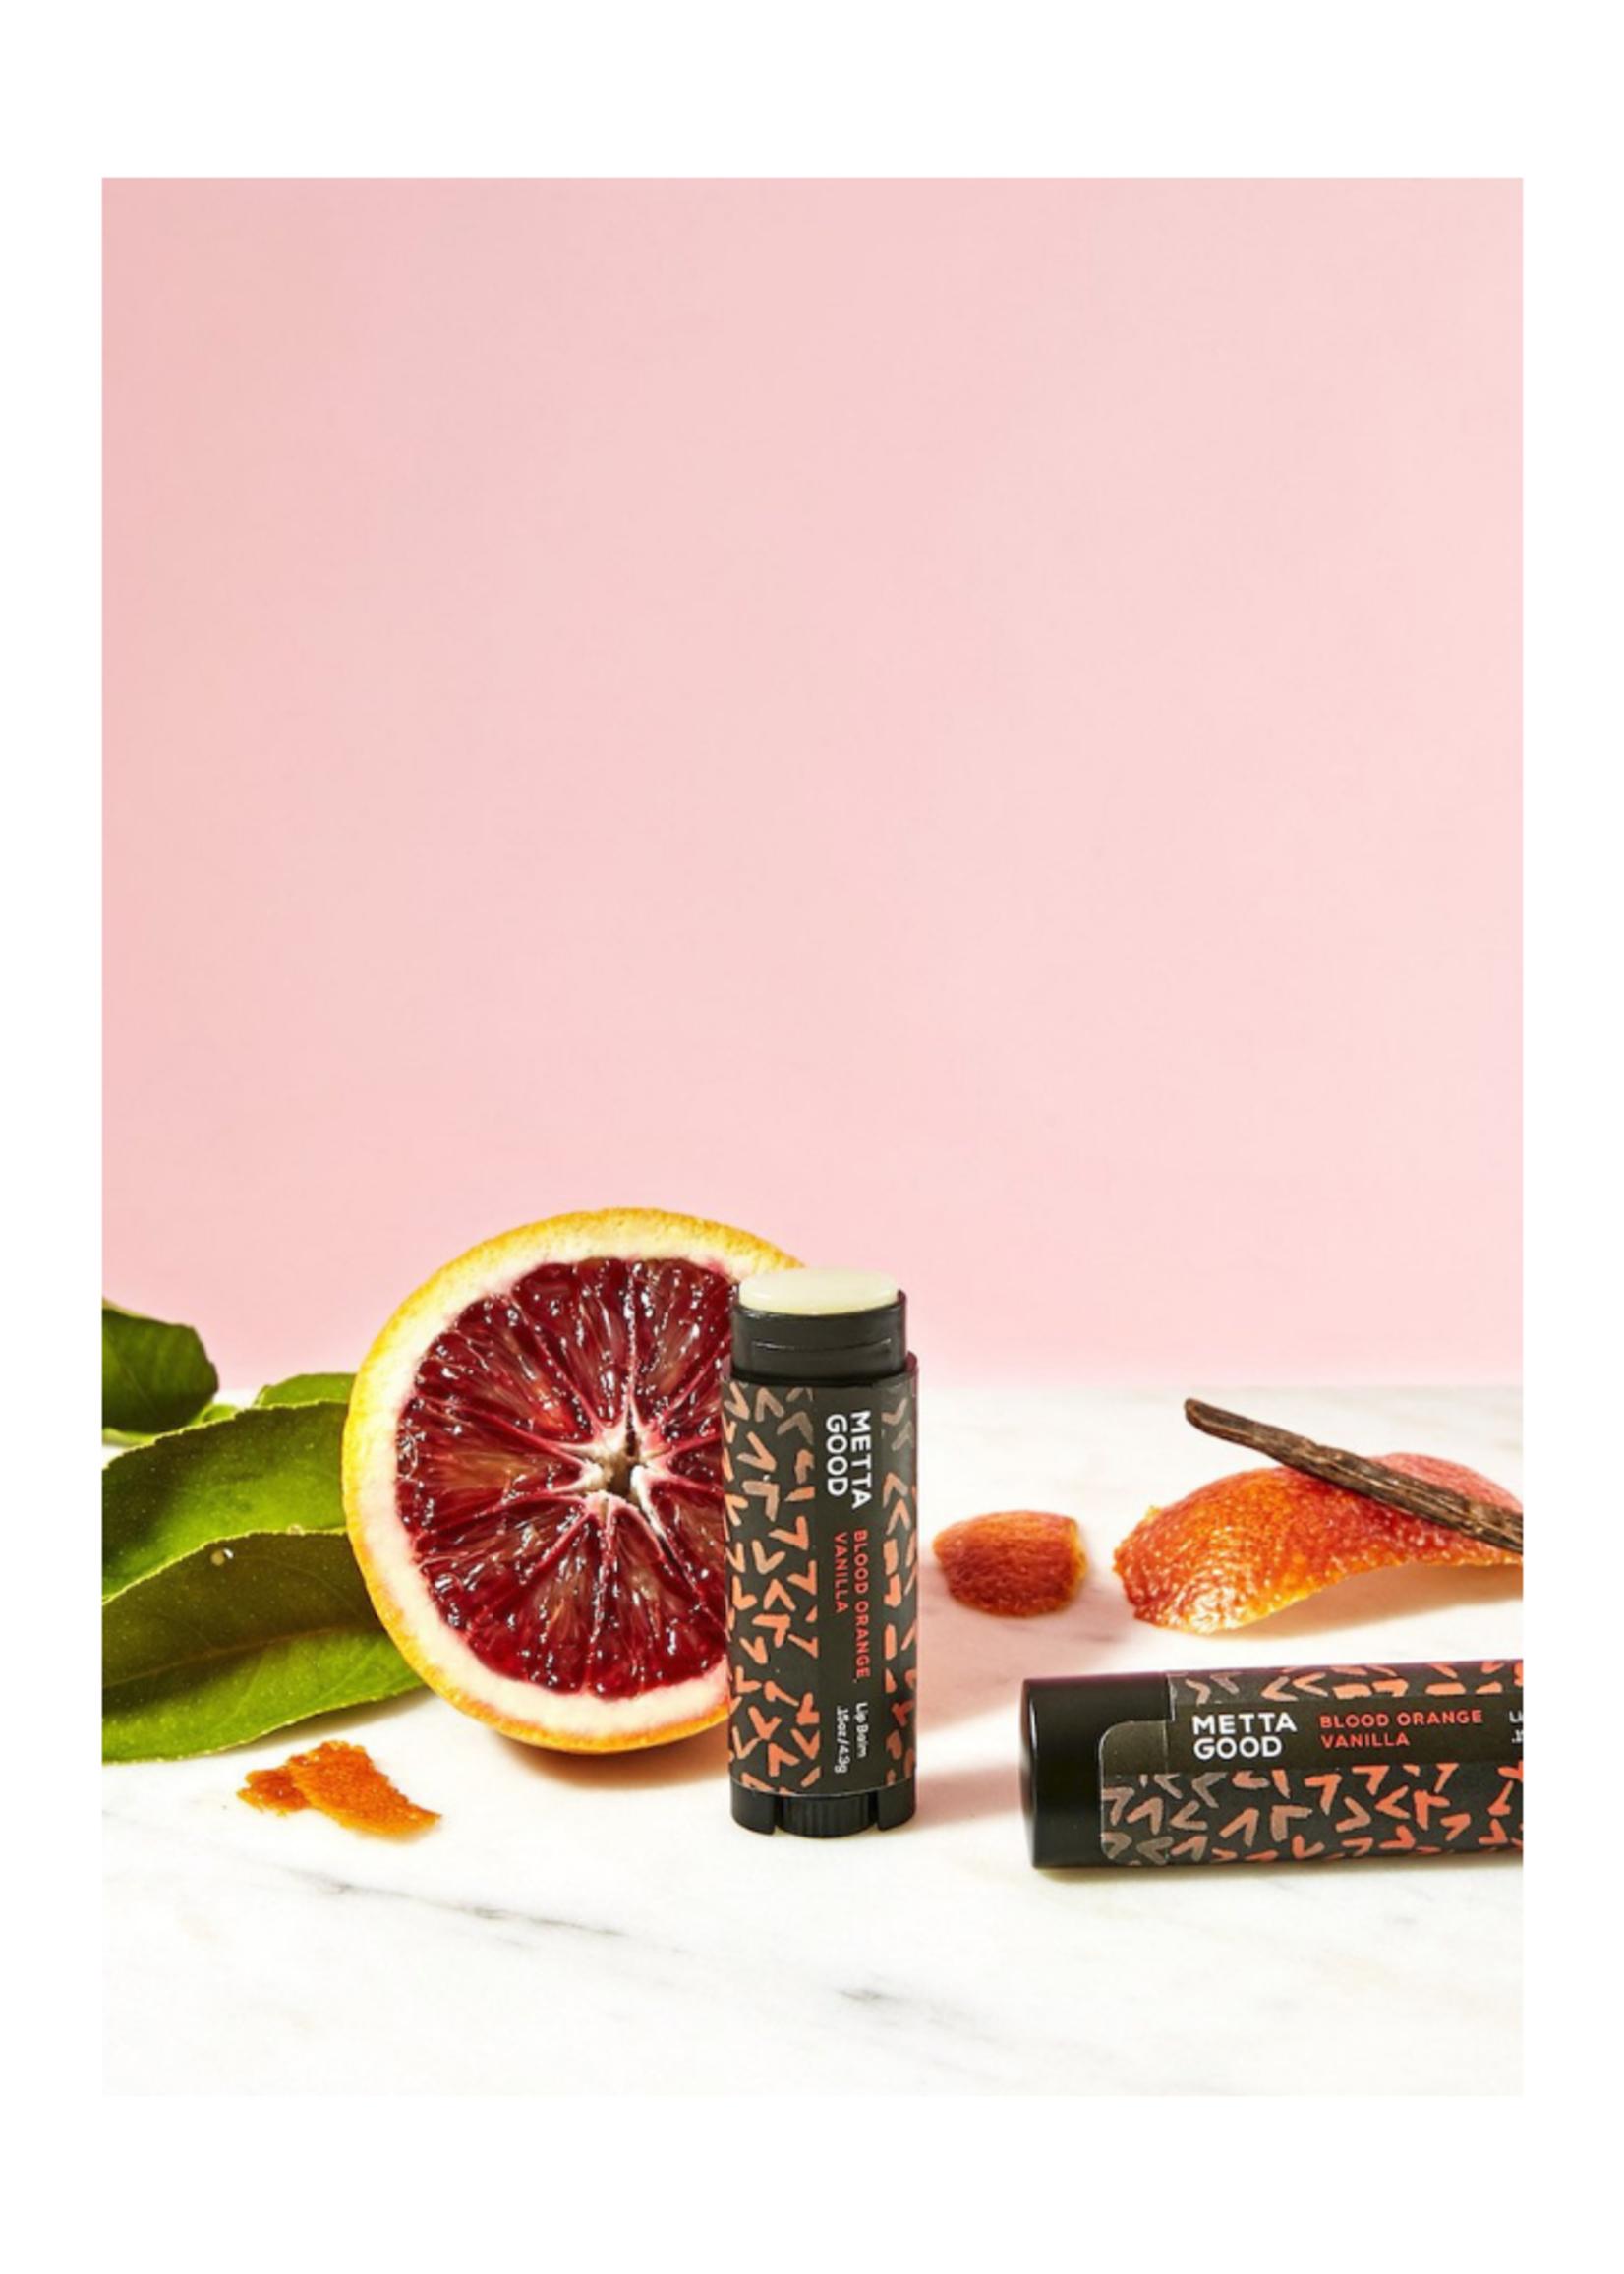 Metta Good Natural Lip Balm - Blood Orange Vanilla